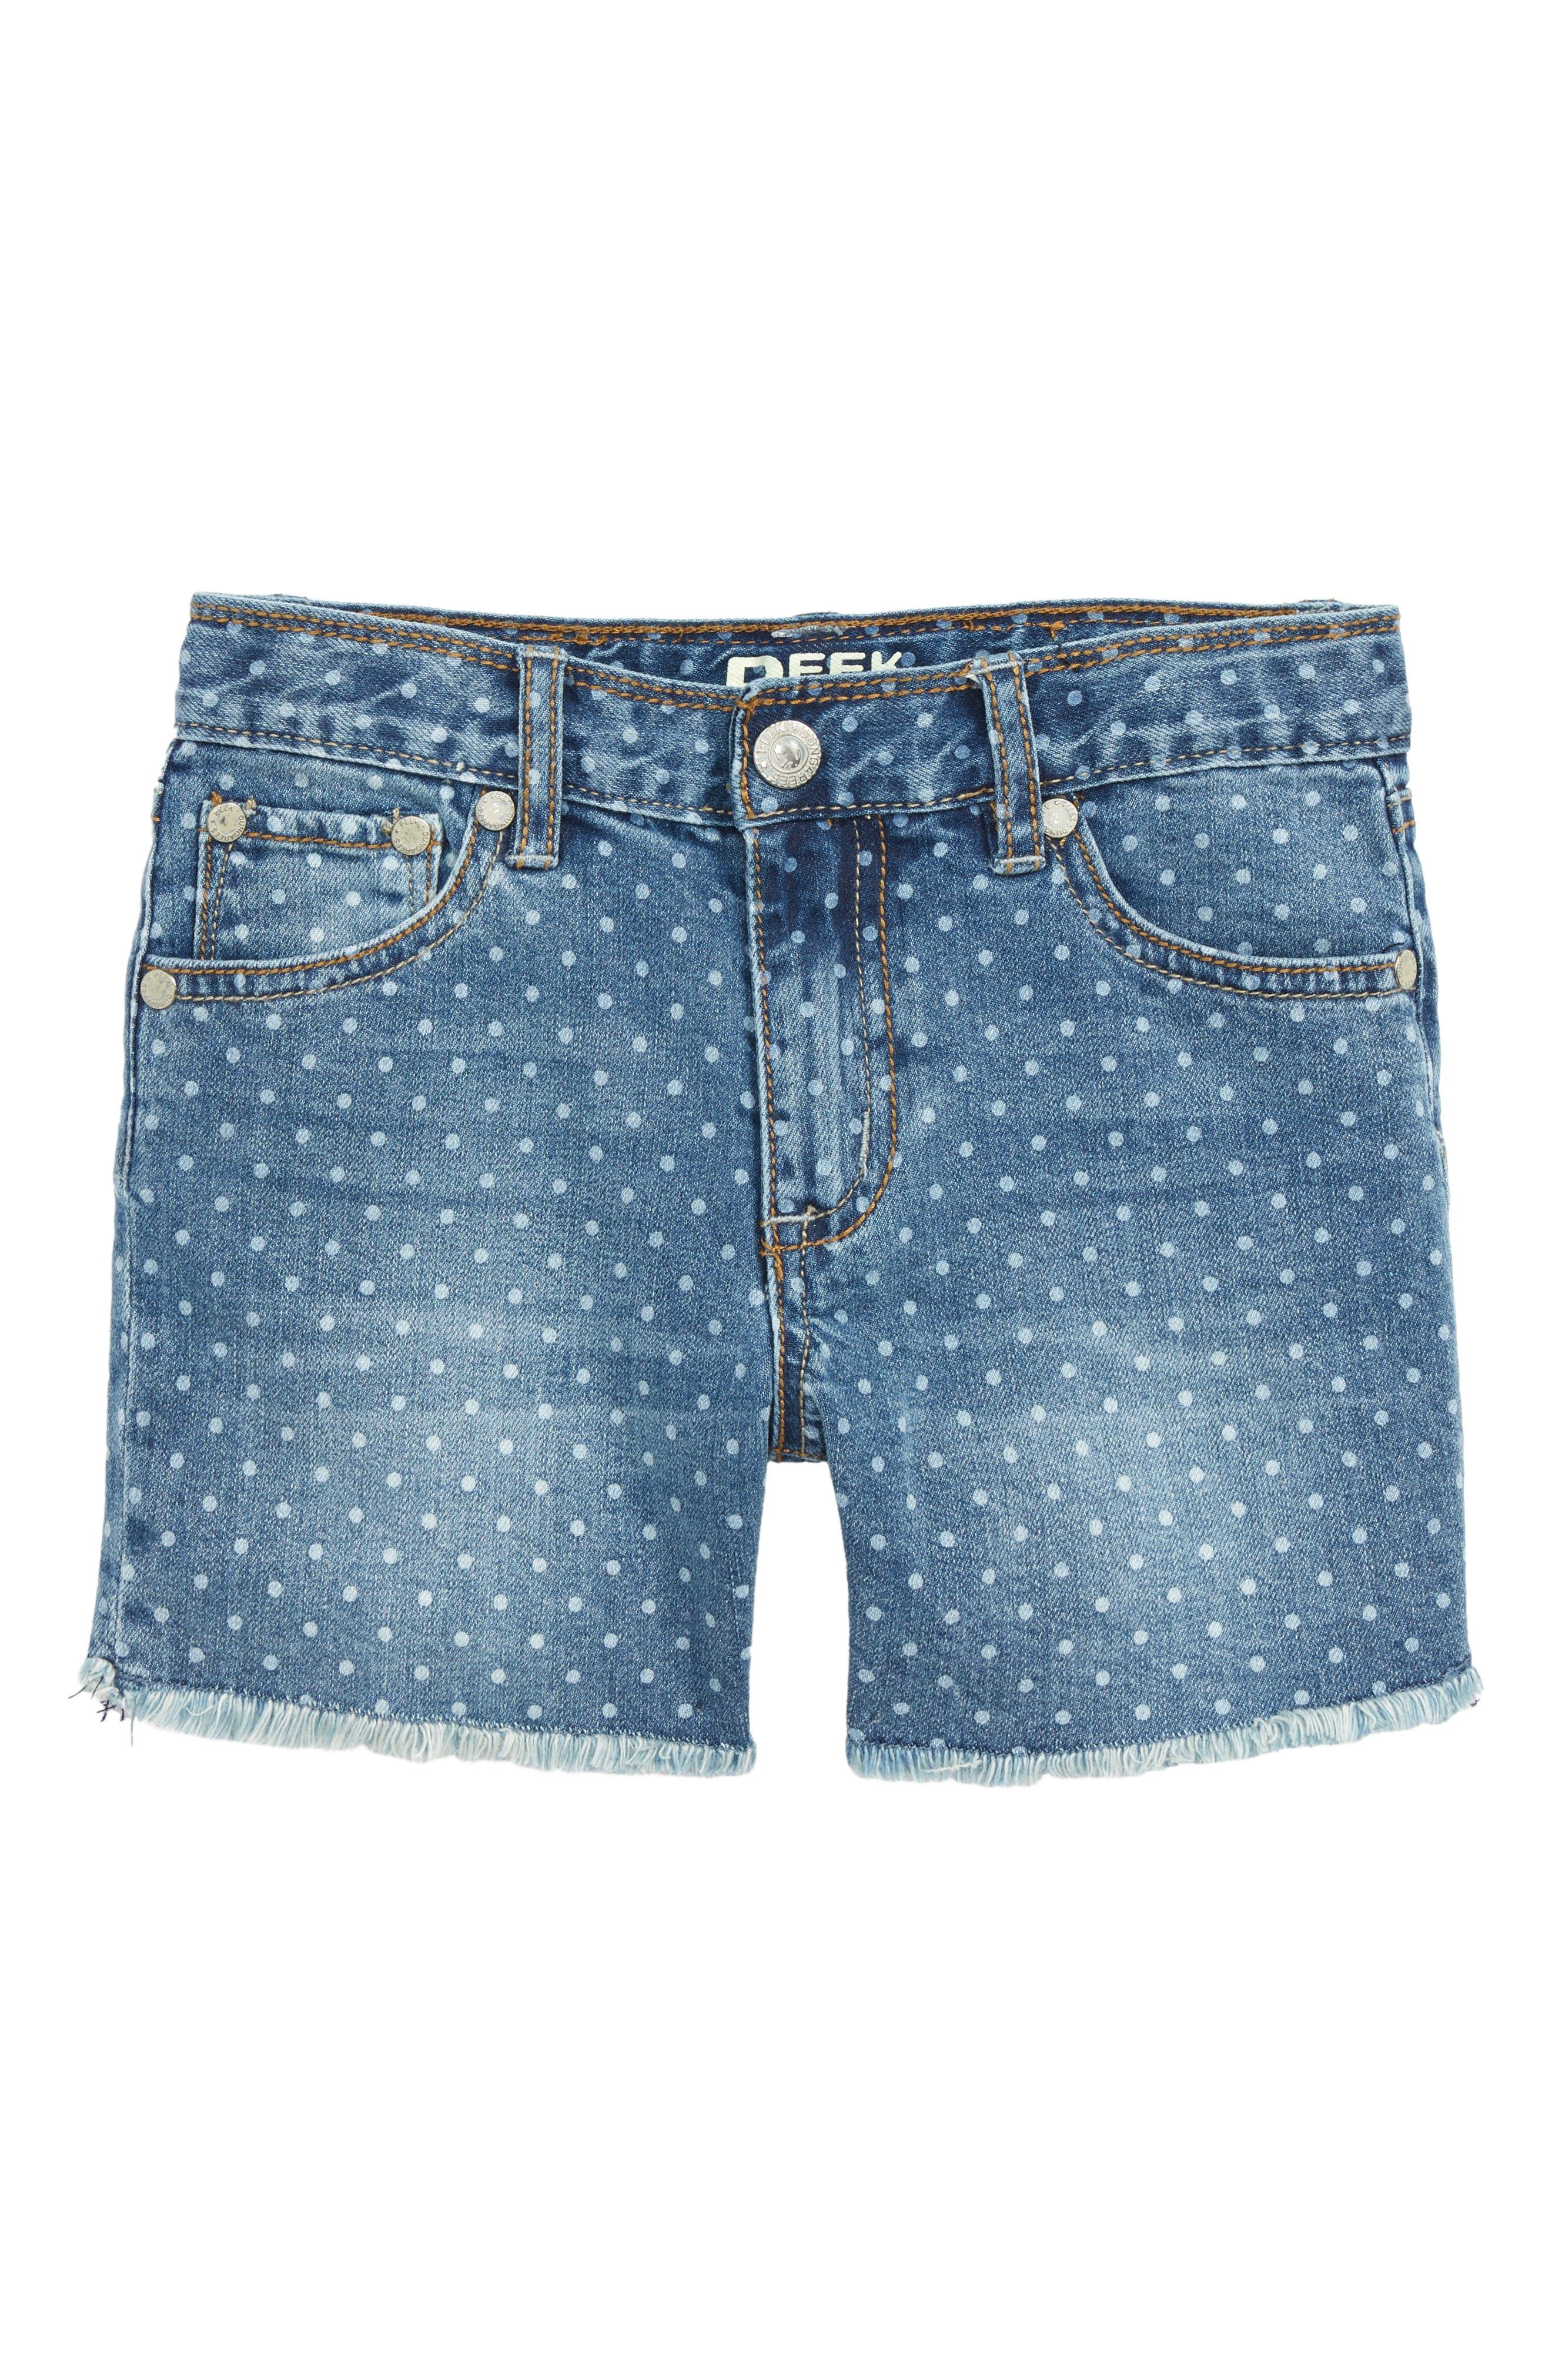 Griffin Dot Cutoff Denim Shorts,                         Main,                         color,